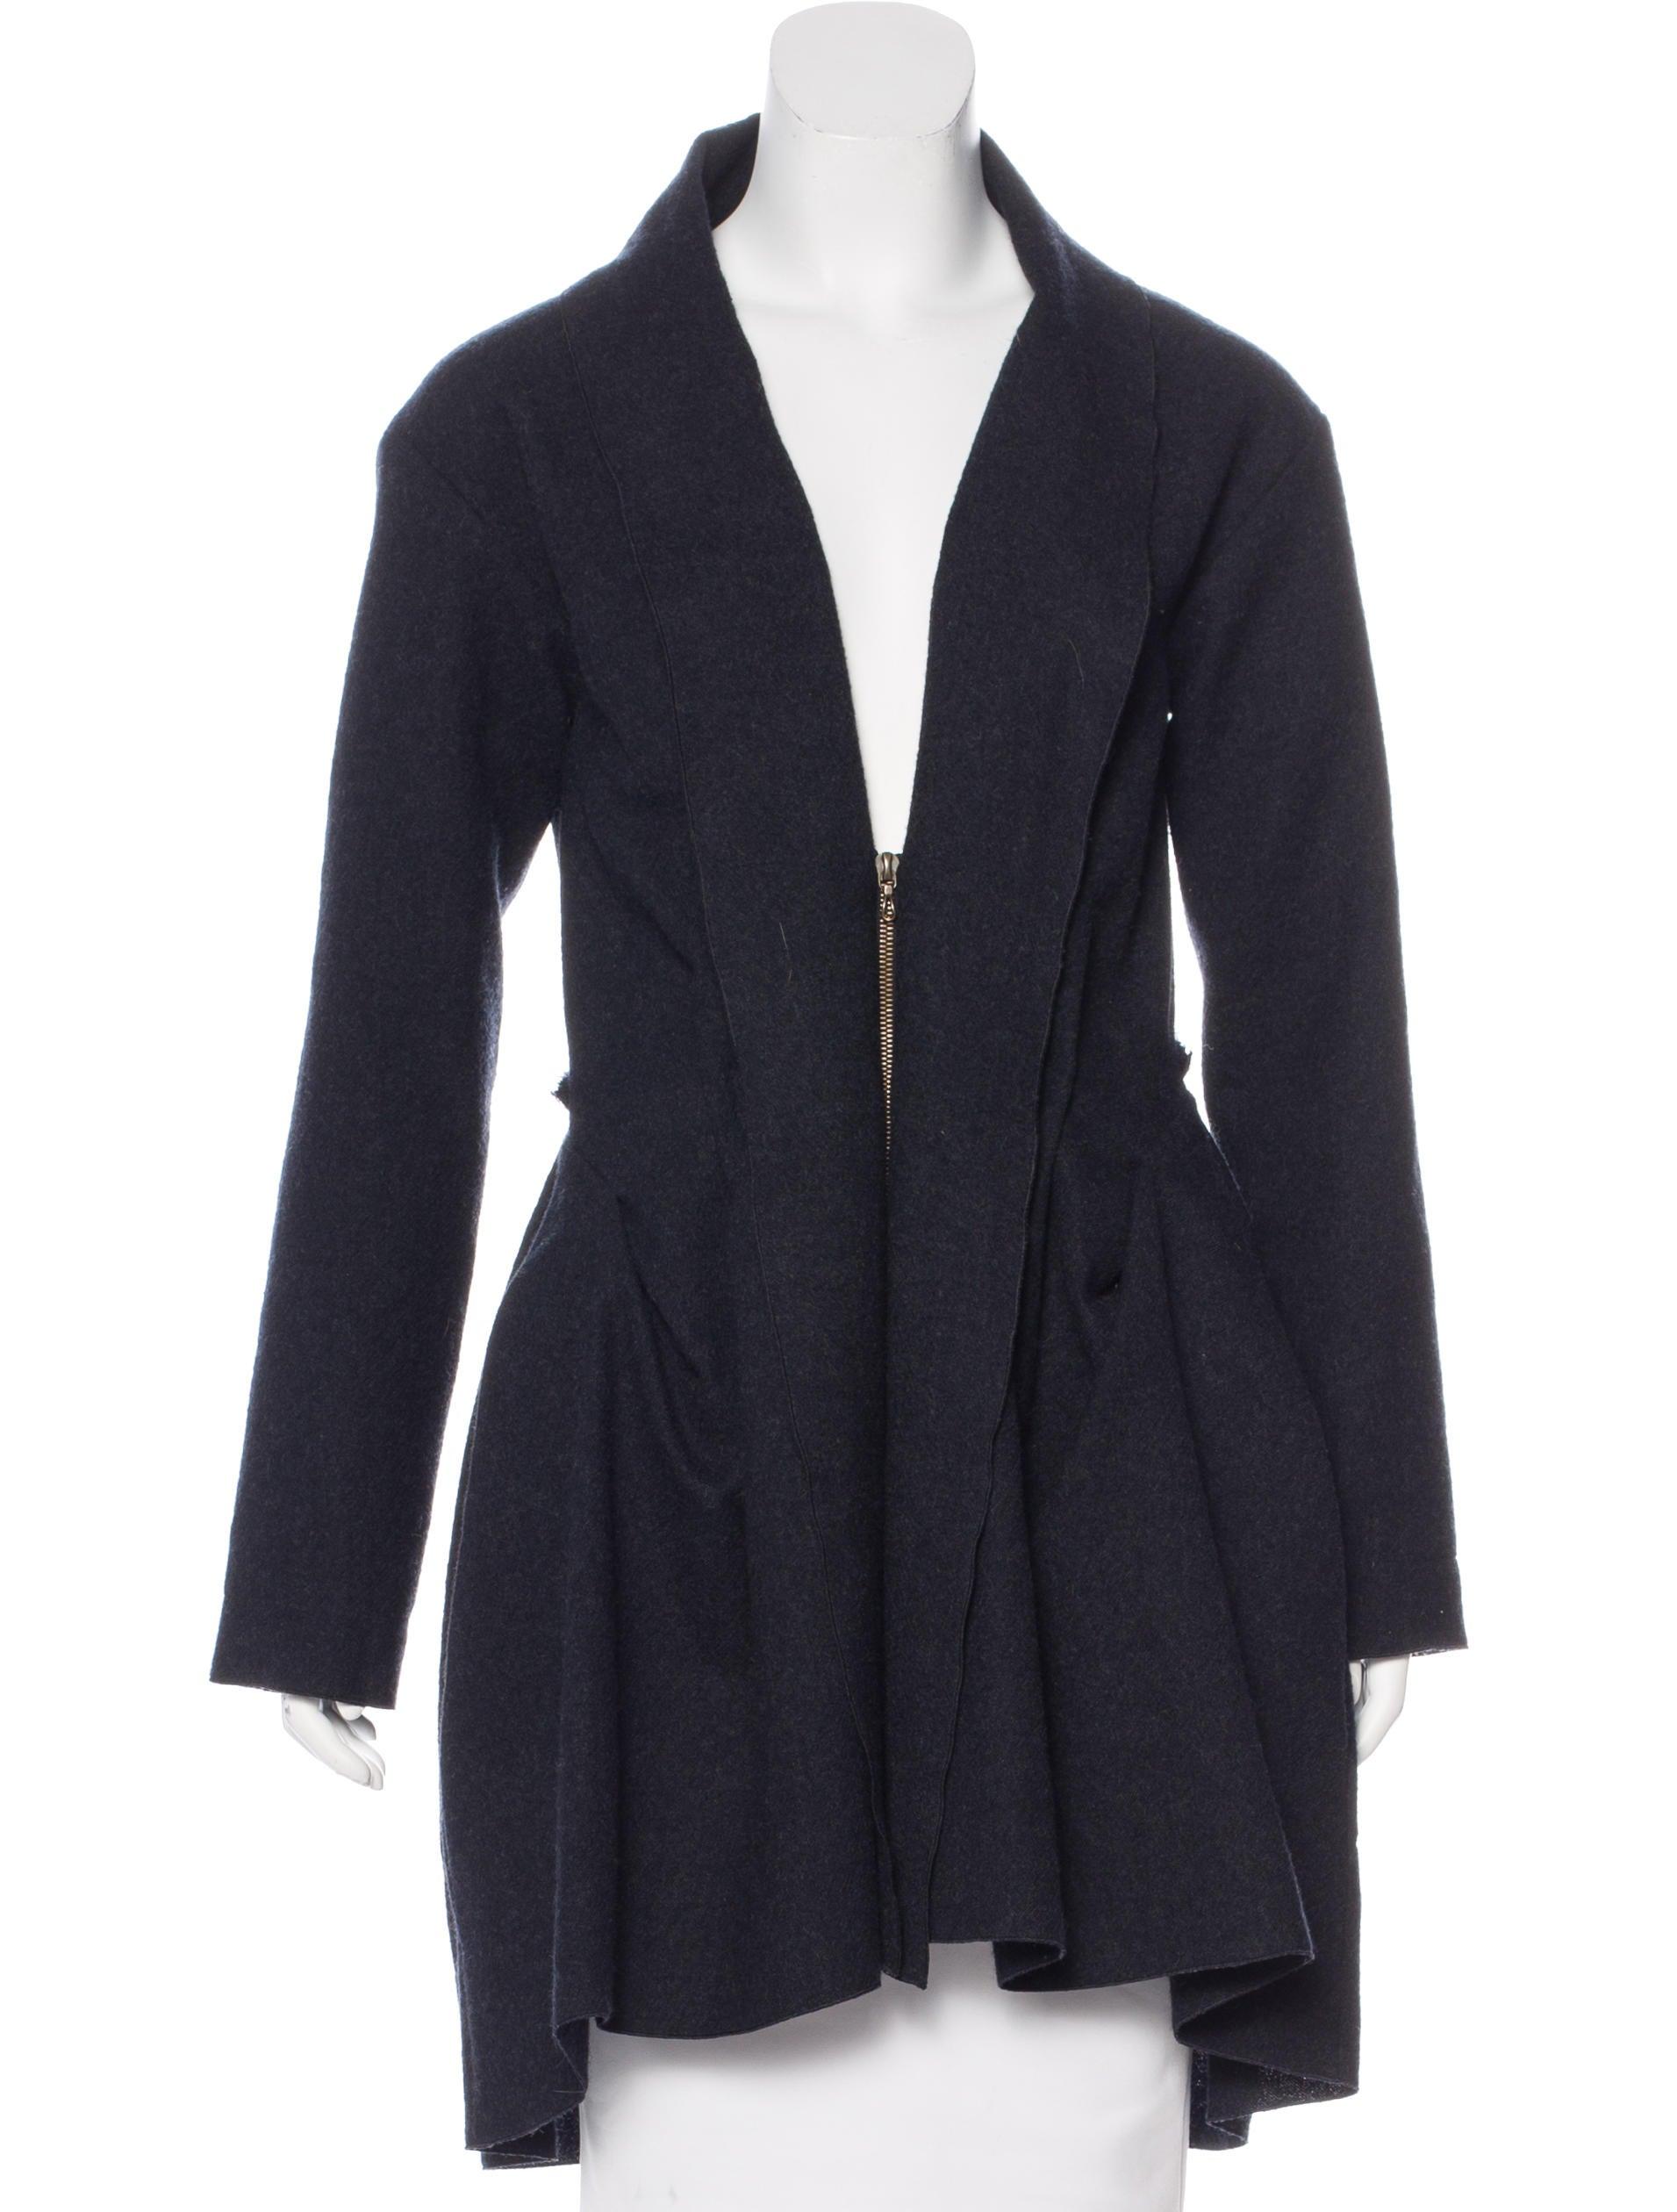 Lanvin Wool Pleated Jacket - Clothing